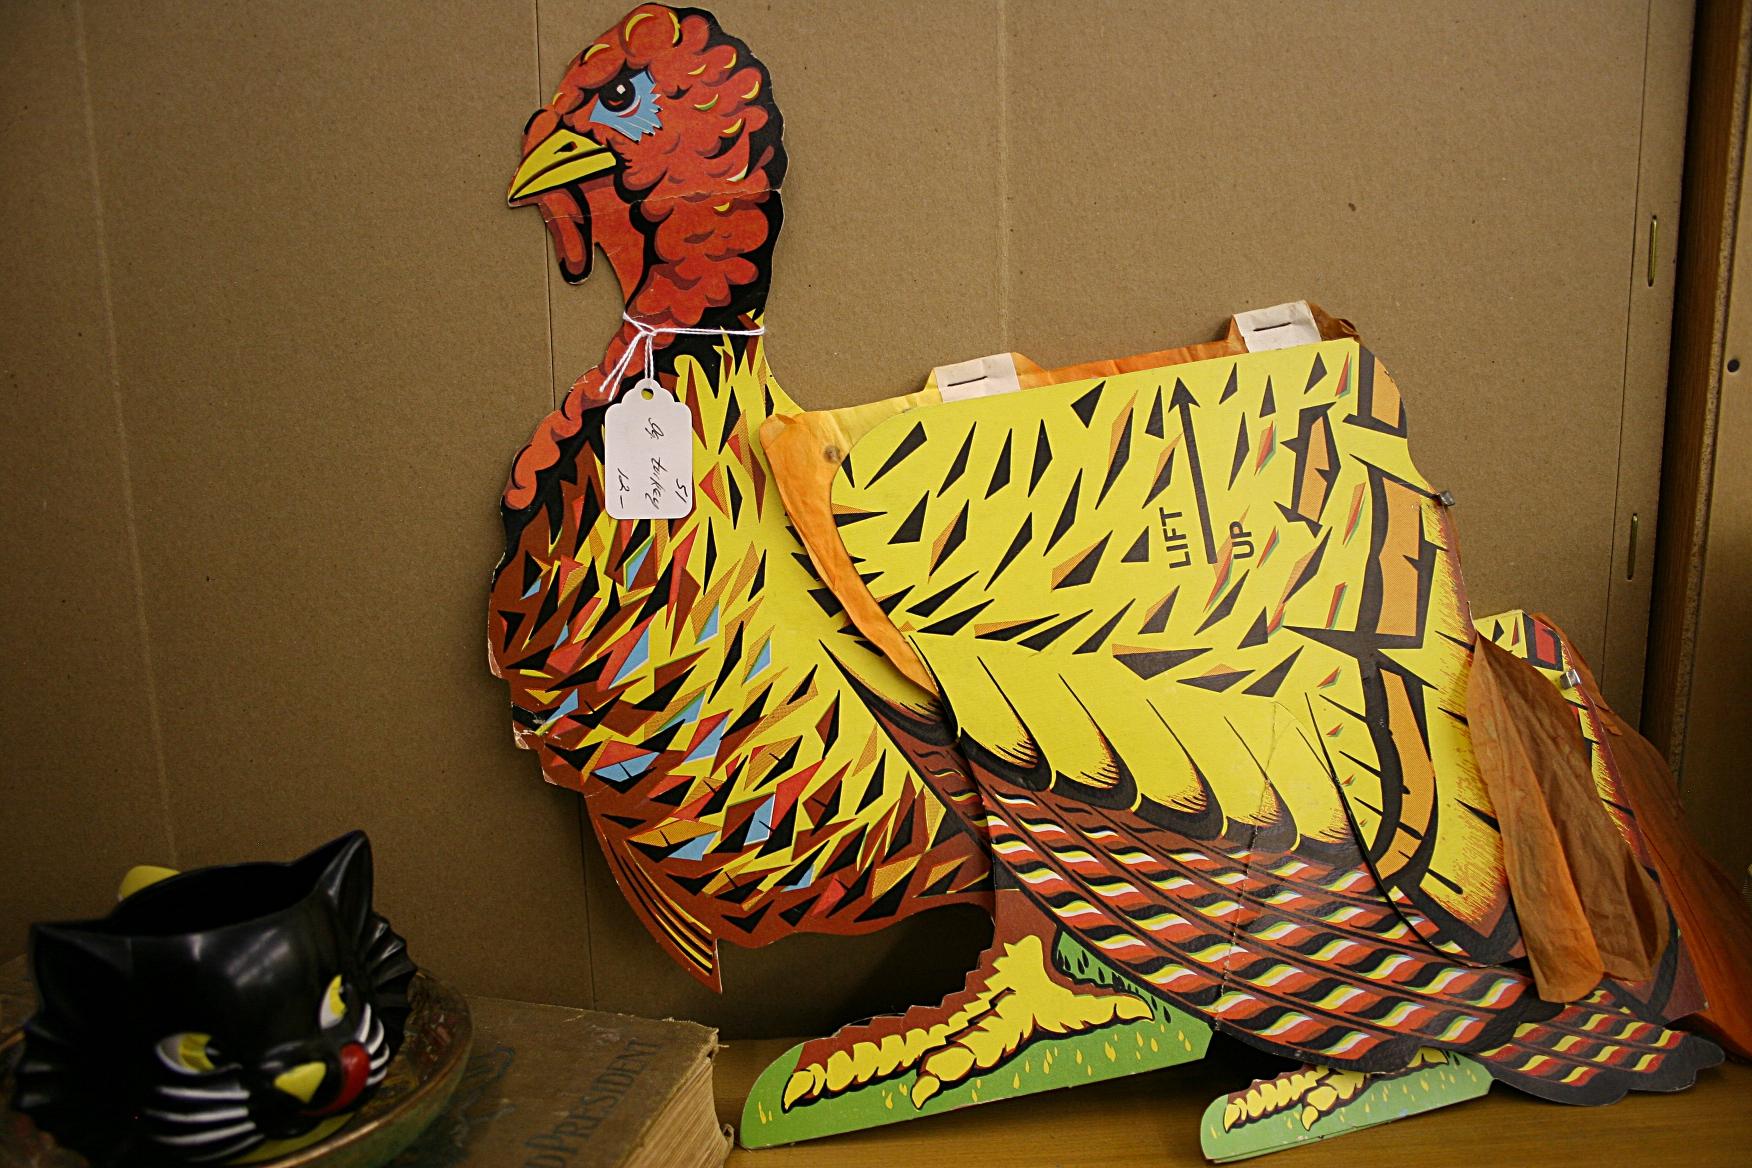 Decorate Turkey Drawing a Vintage Turkey Decoration